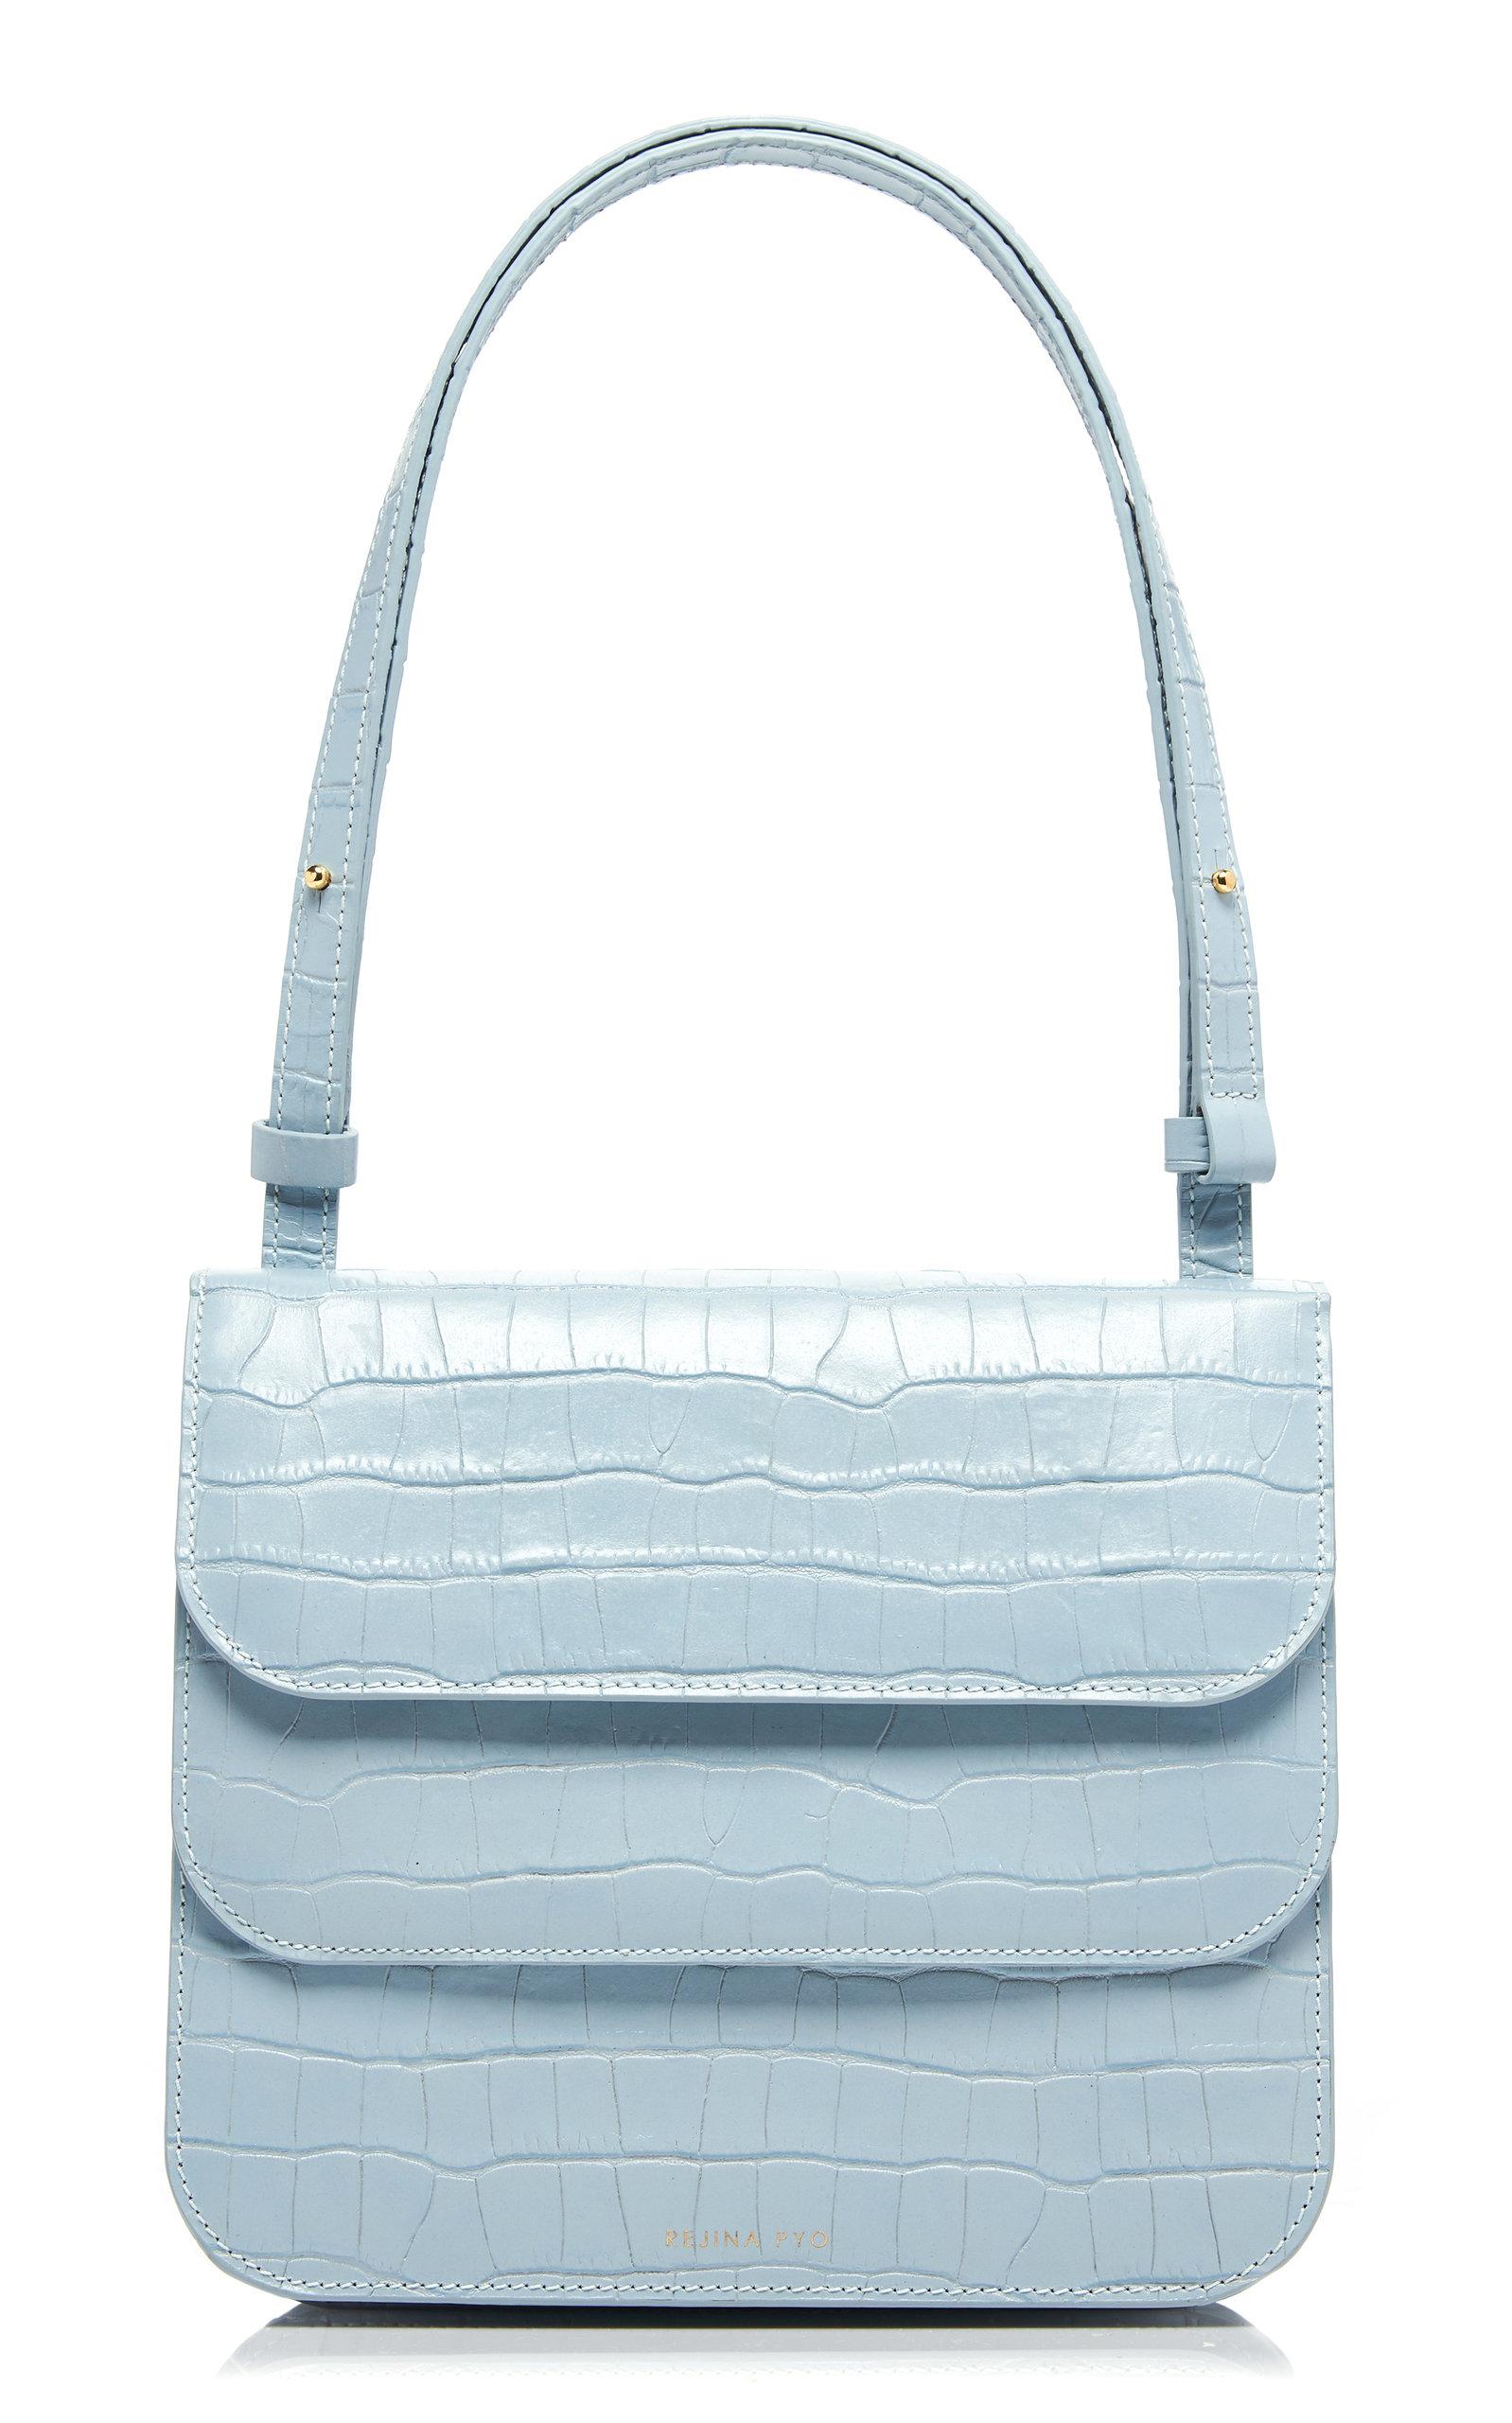 Rejina Pyo Crossbody Ana Croc-Effect Leather Shoulder Bag